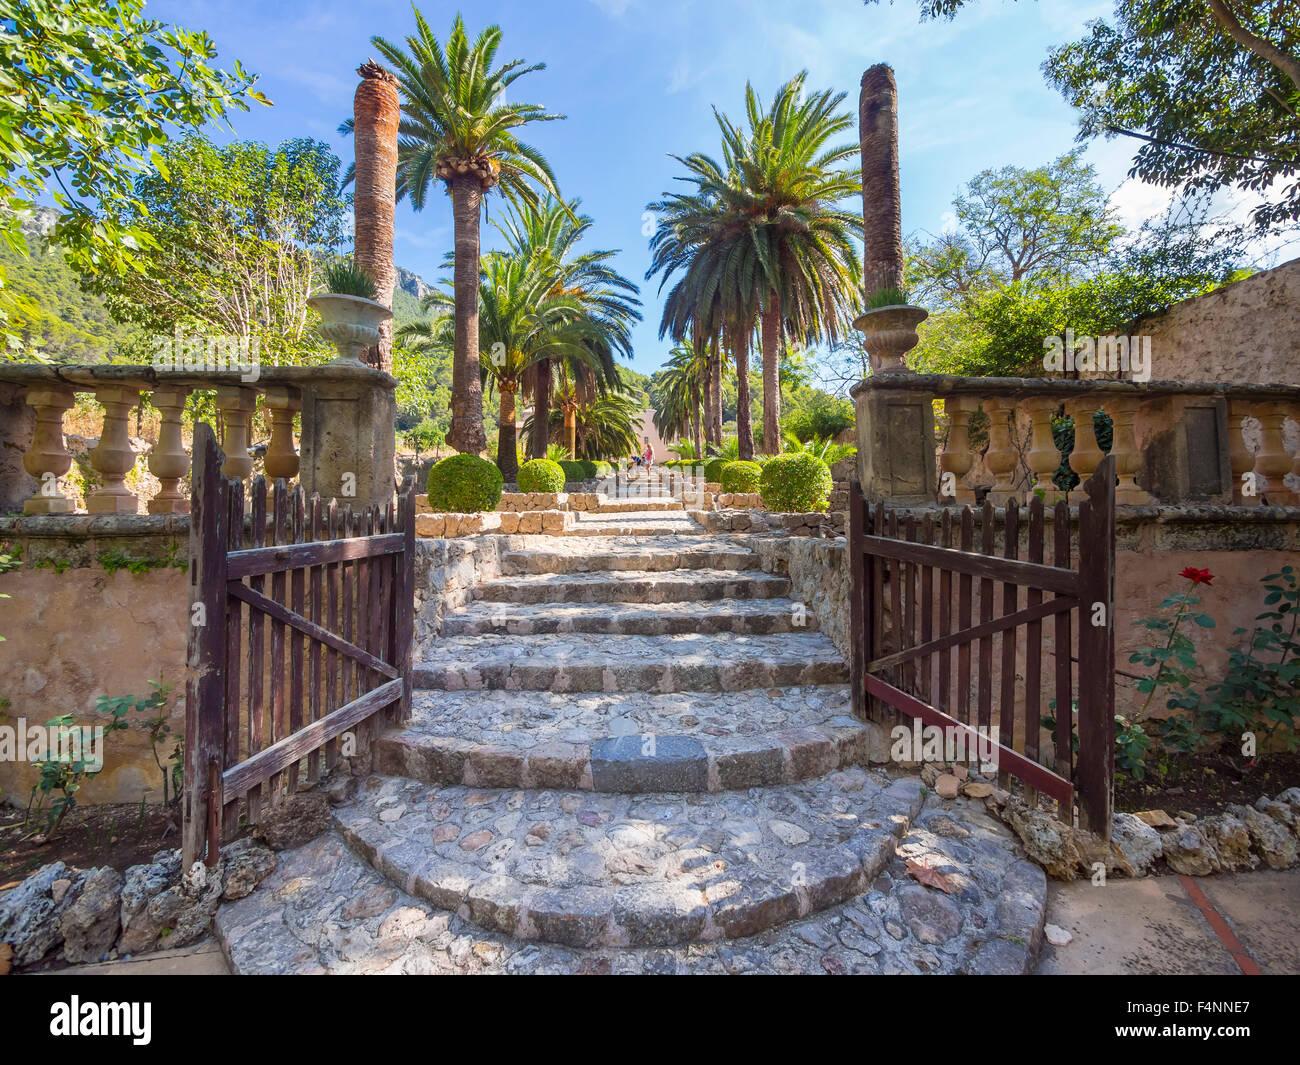 Eingang, Jardines de Alfabia, Arabische Gärten, Serra de Alfàbia, Mallorca, Spanien Stockbild